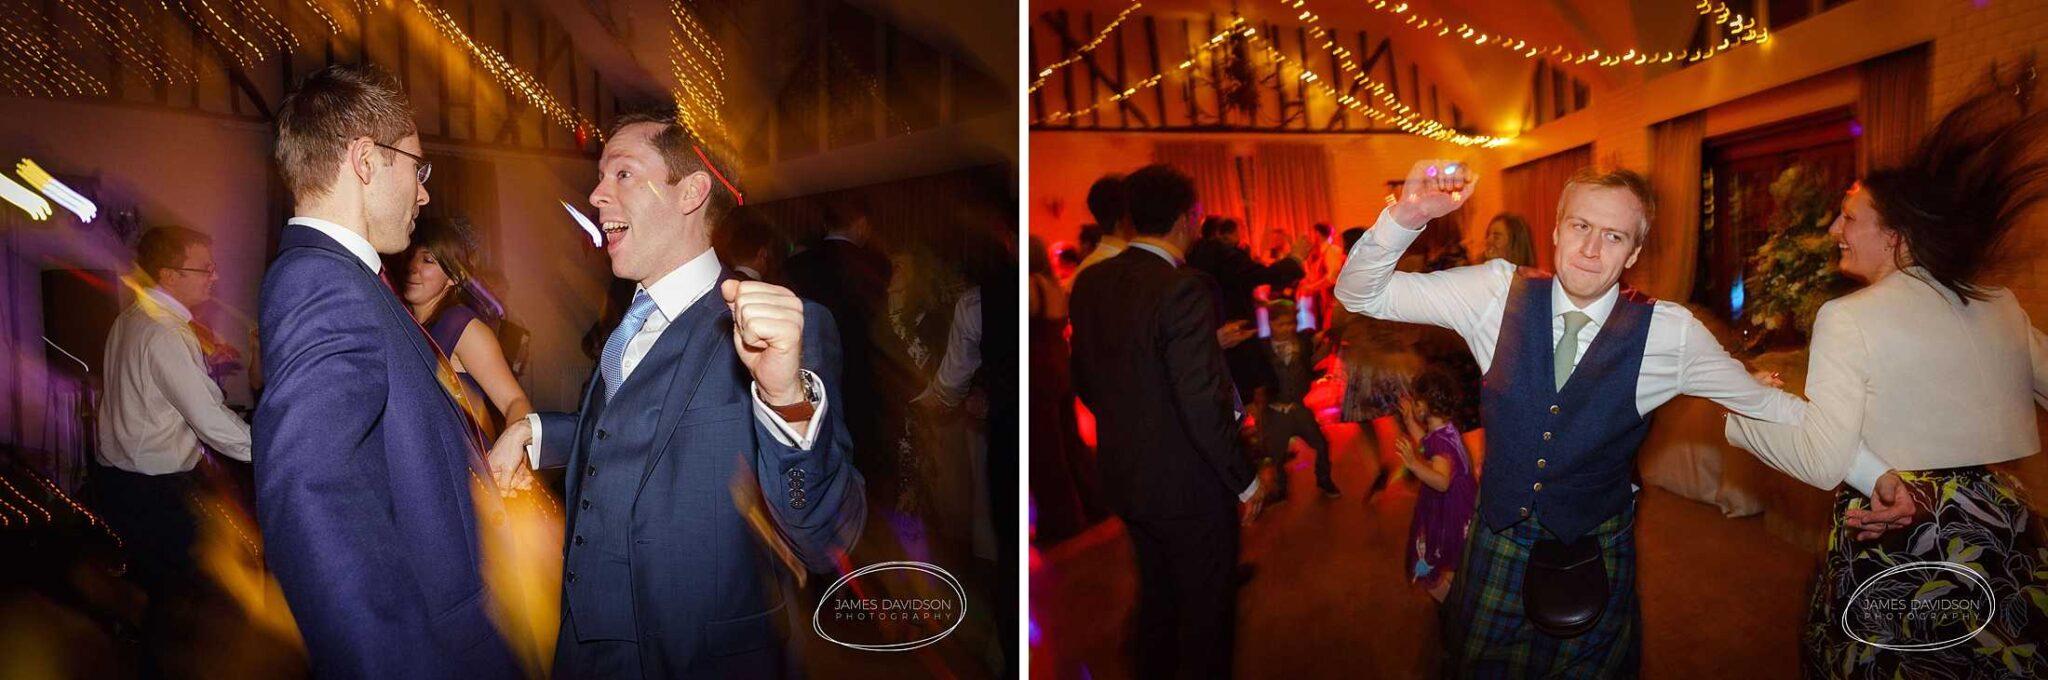 seckford-hall-wedding-097